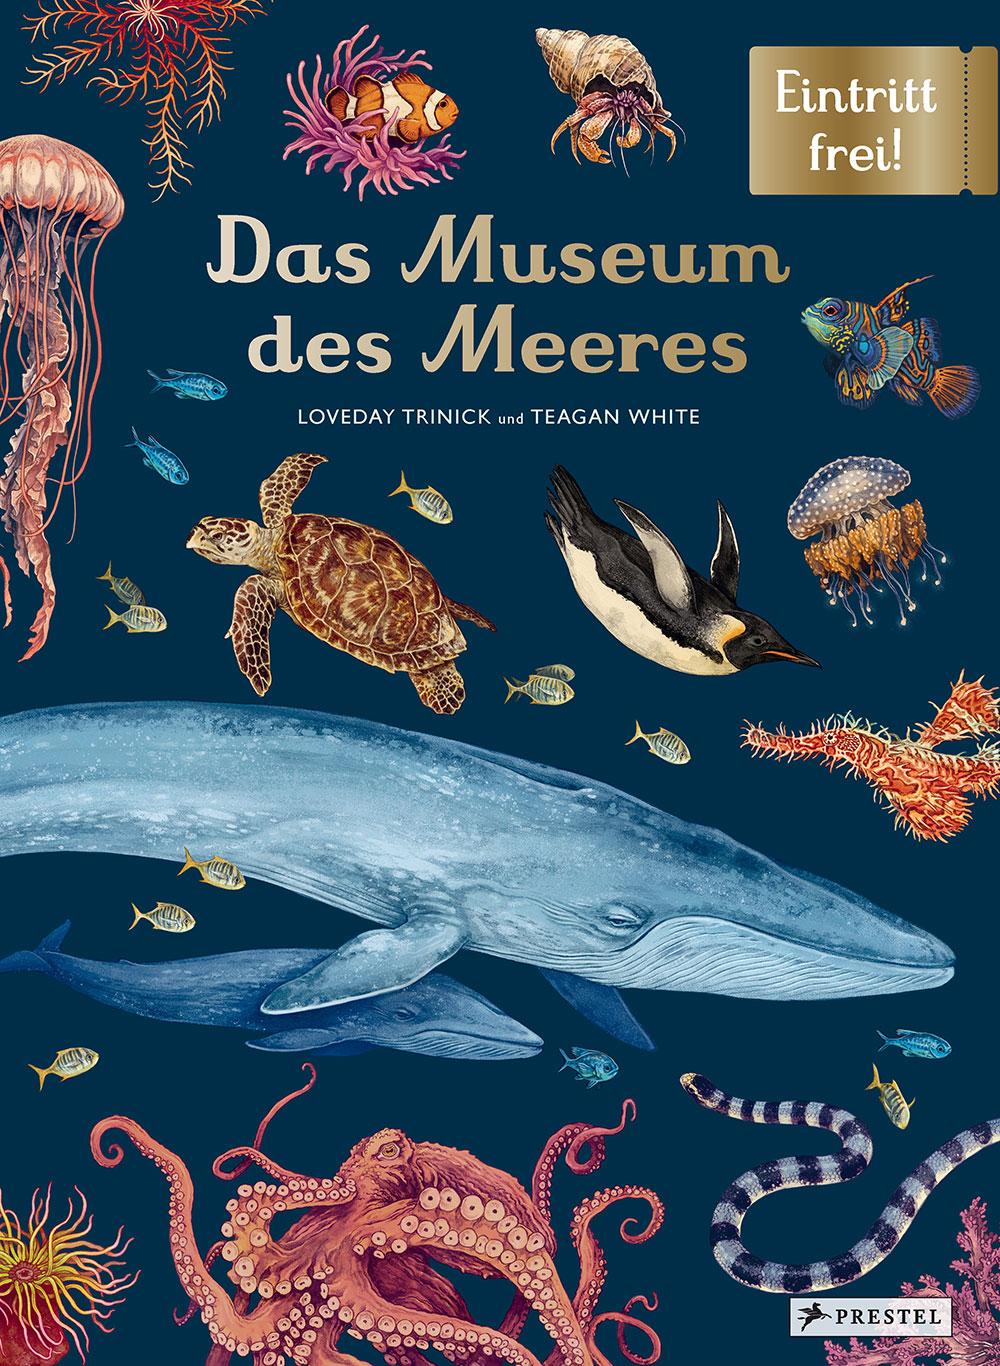 »DAS MUSEUM DES MEERES« - PRESTEL